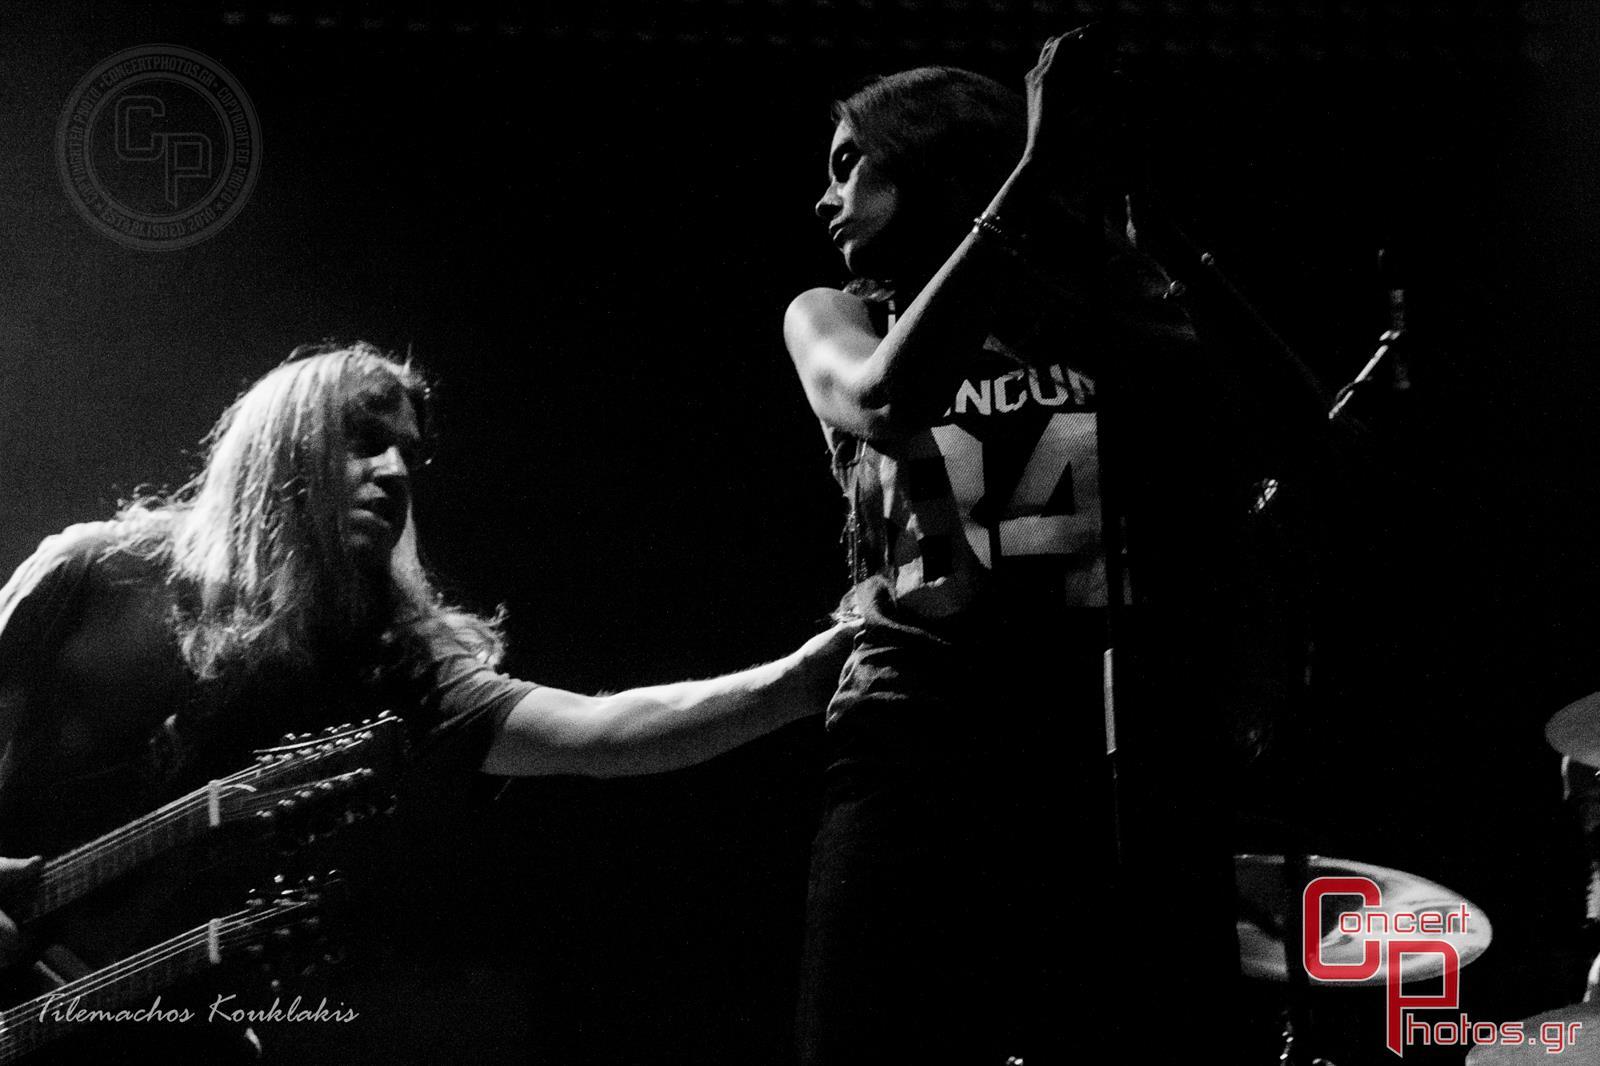 Neurosis-Neurosis photographer:  - concertphotos_20140707_23_56_49-8